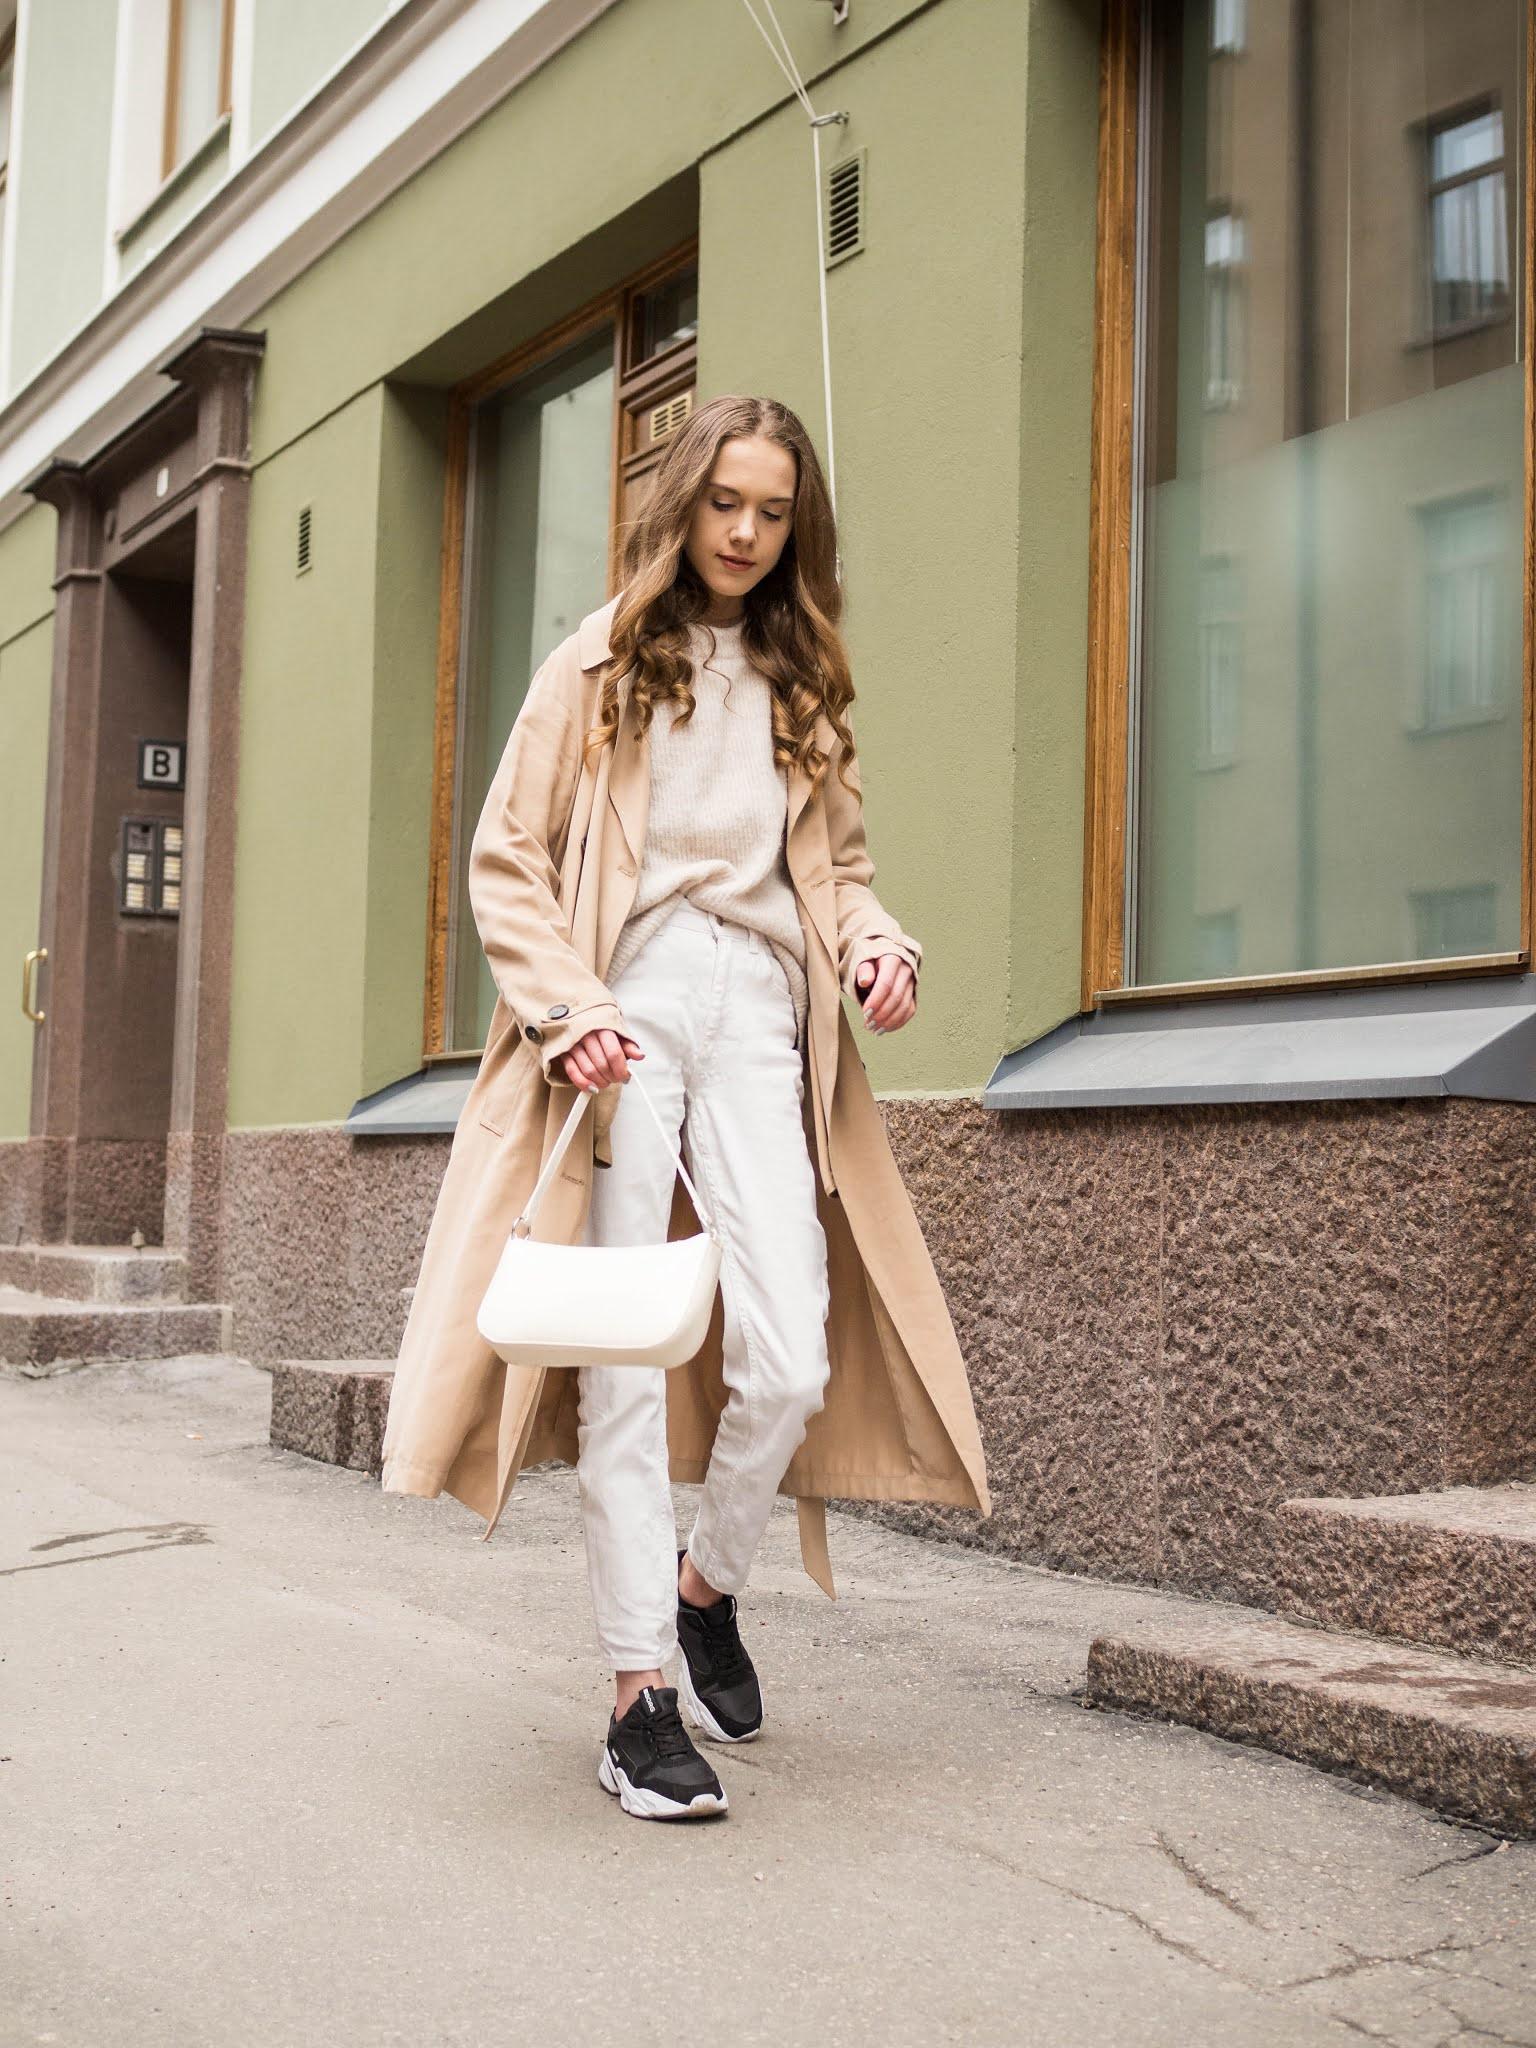 Kevätasu trenssitakin kanssa // Spring outfit with trench coat